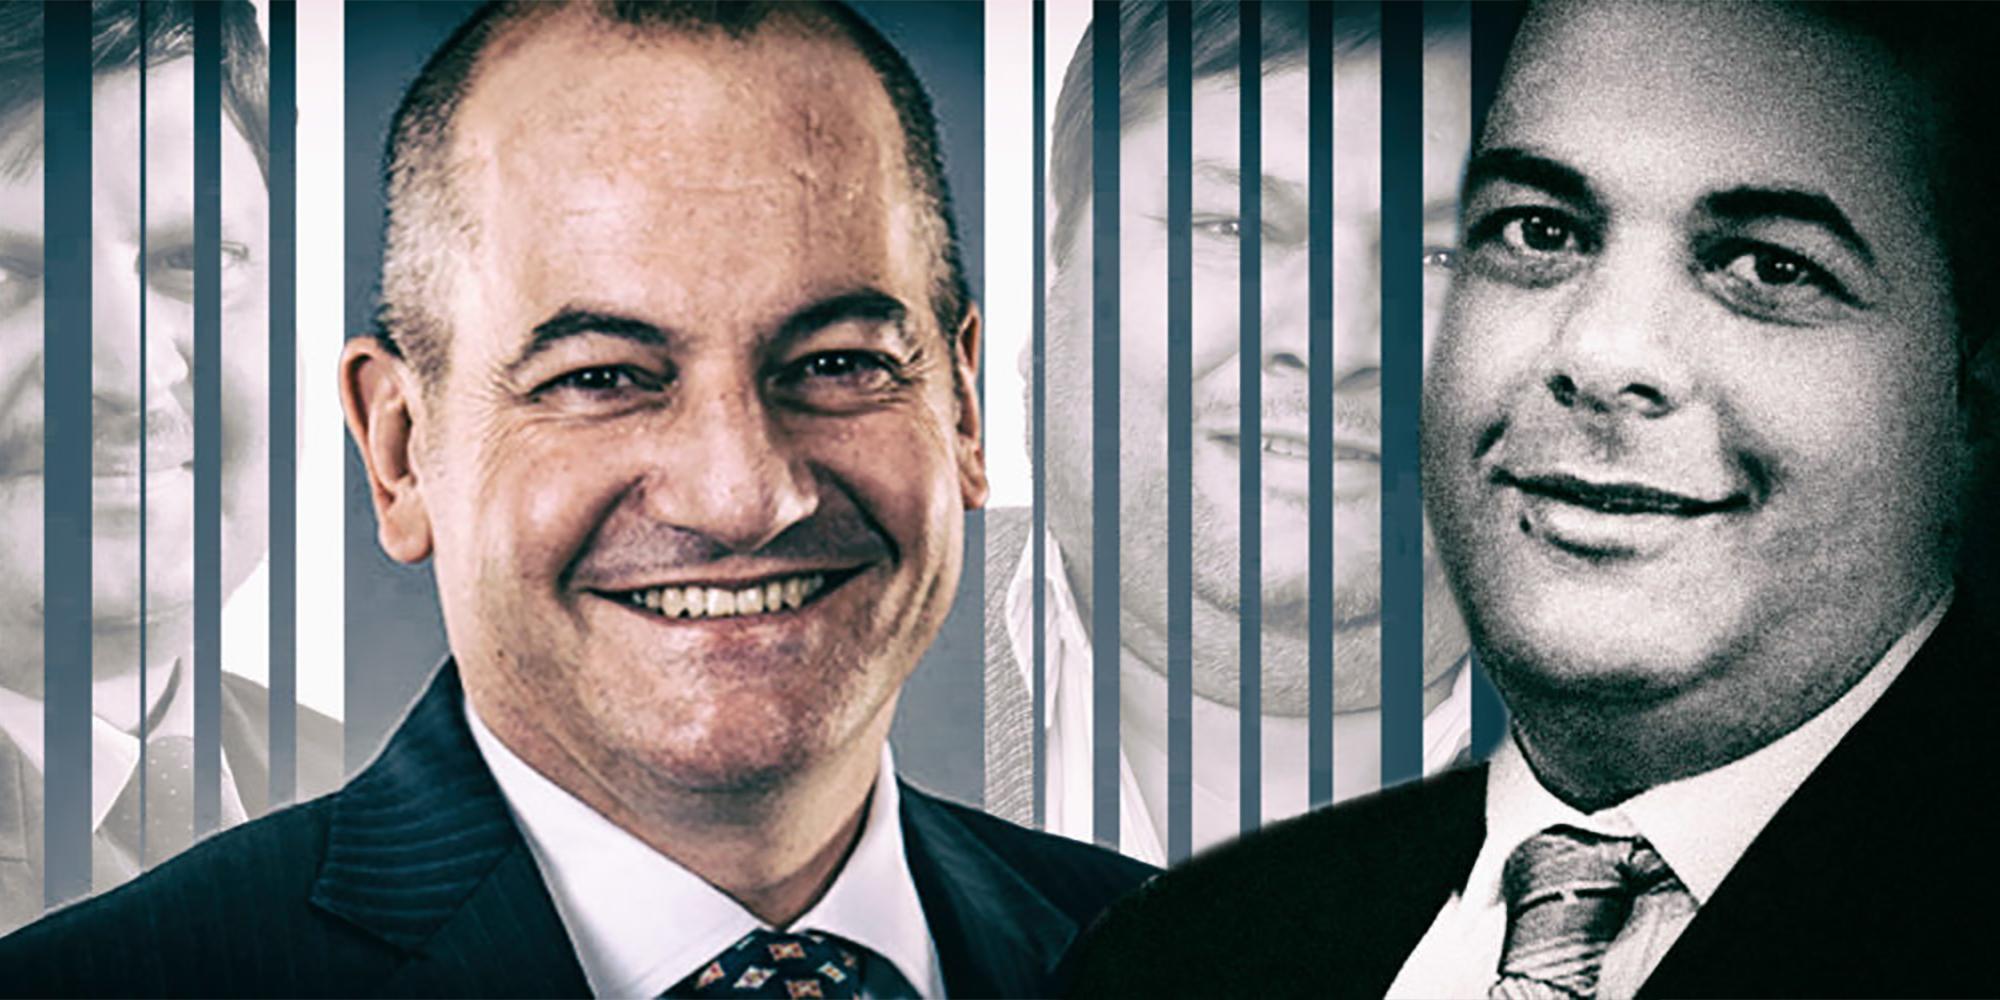 Embattled Trillian blames its cash woes on Salim Essa